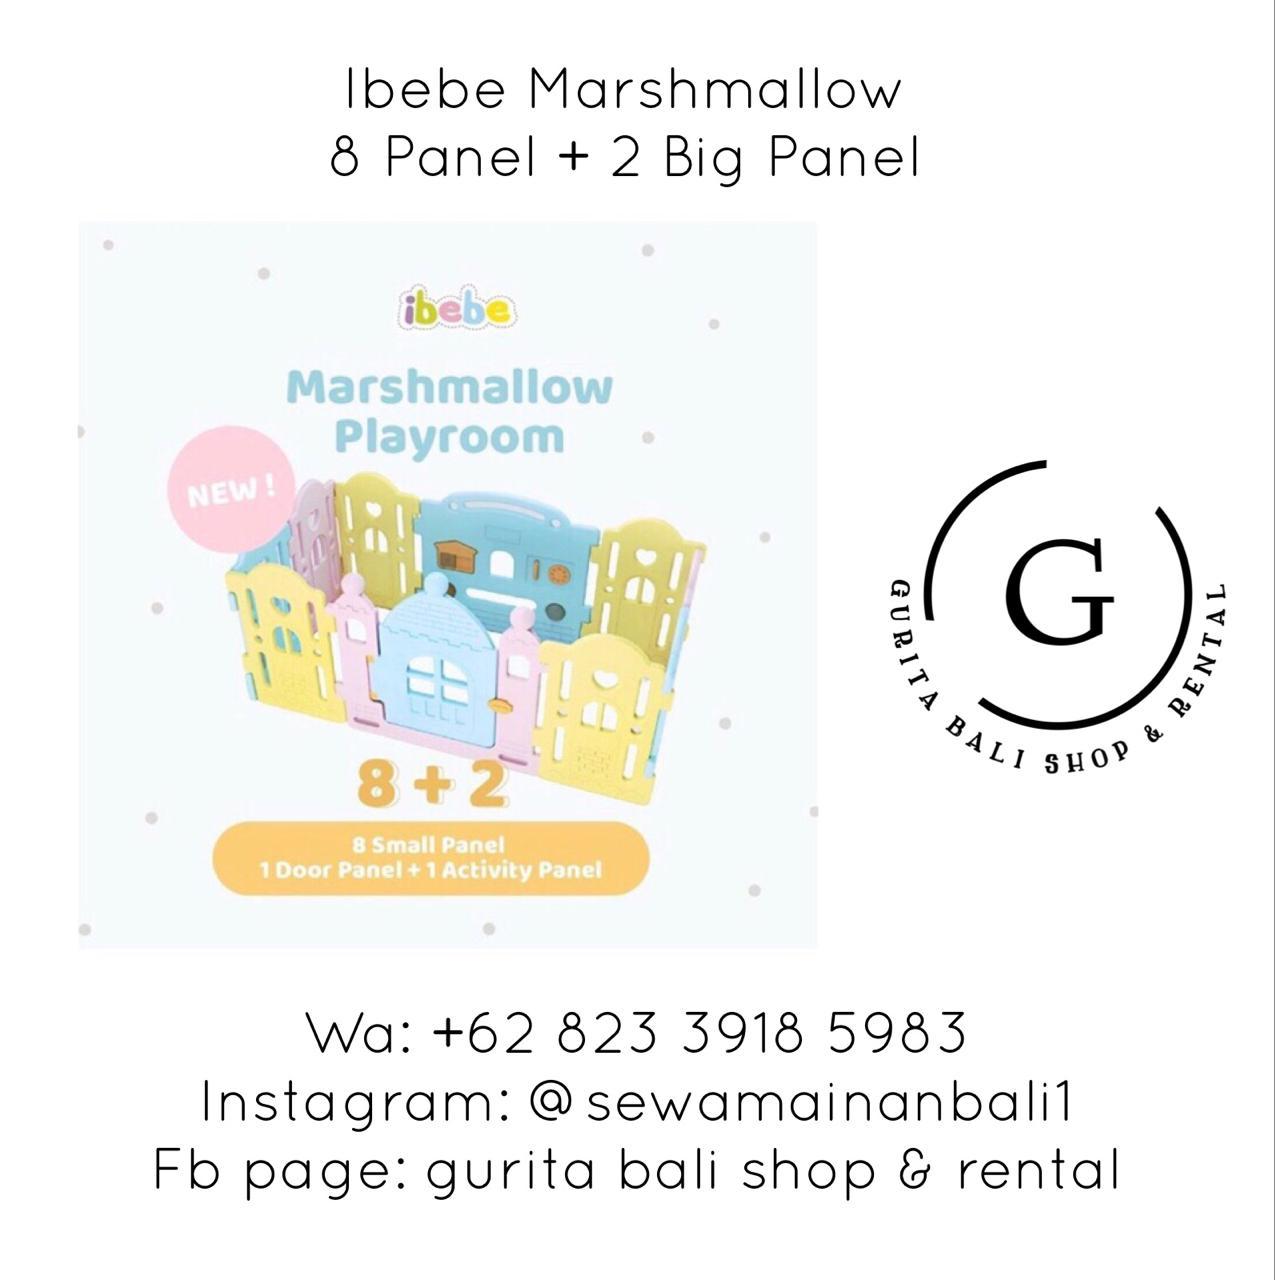 IBEBE MARSHMALLOW 8+2 PANEL (B)